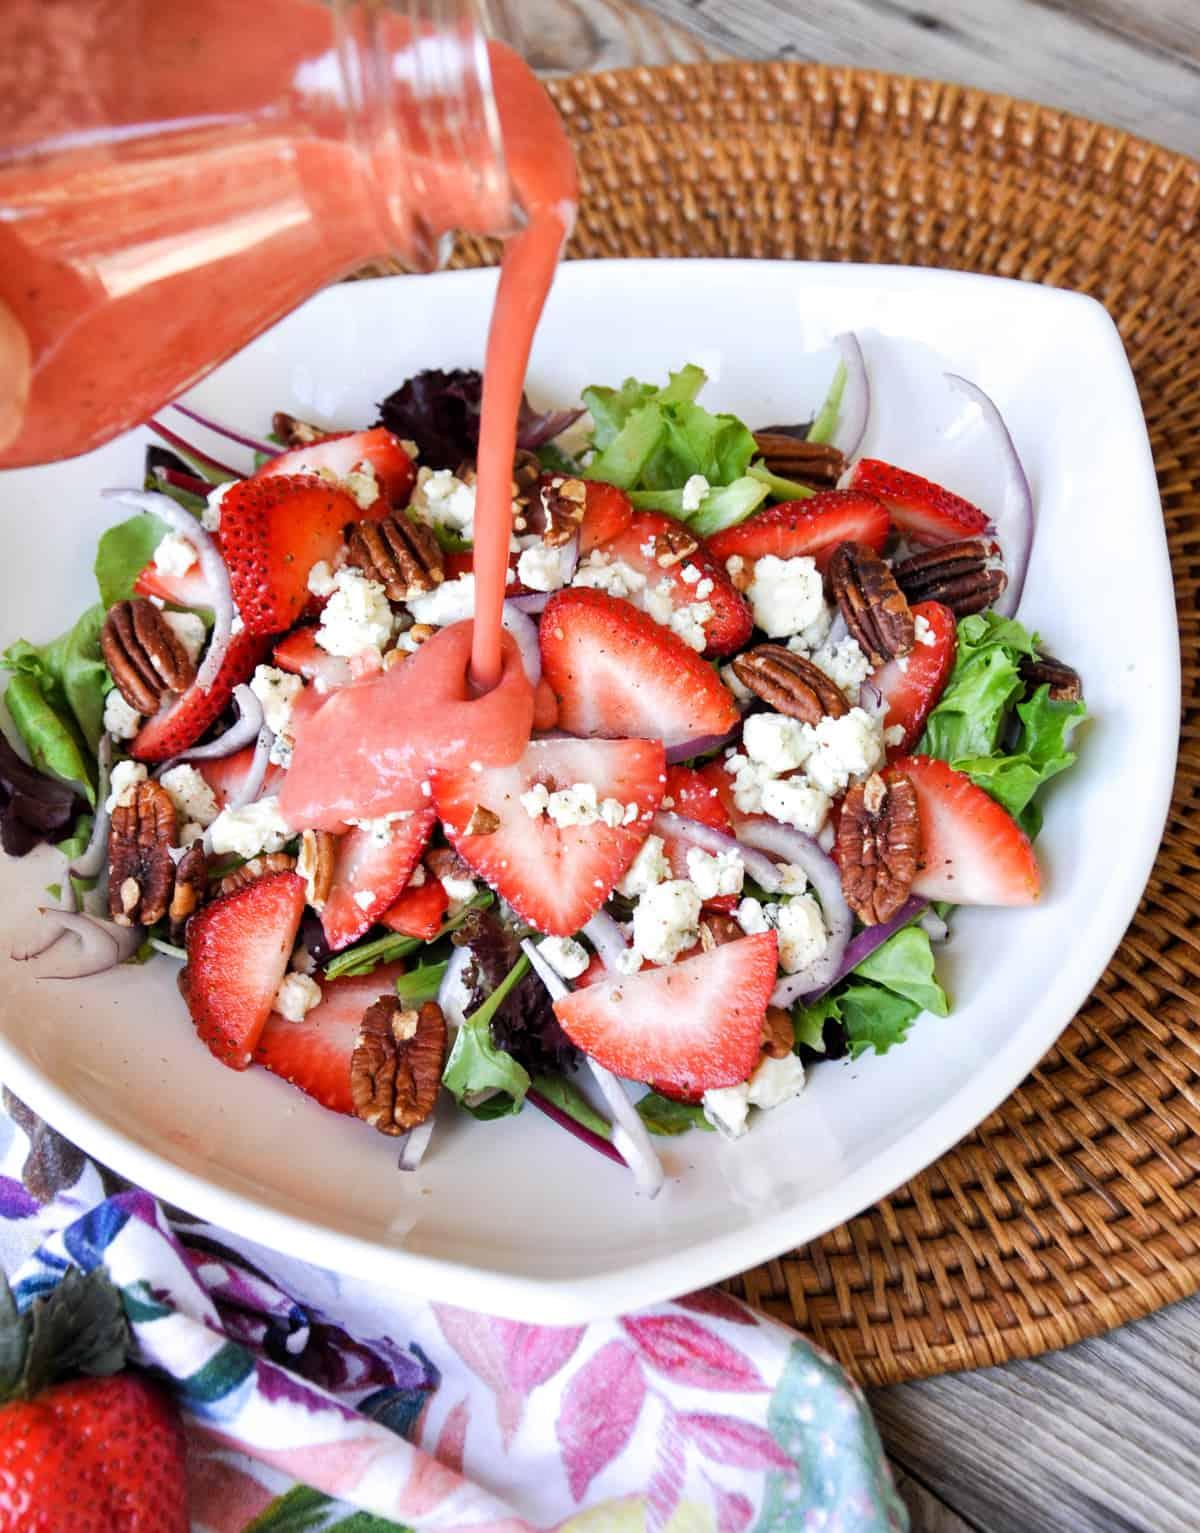 Pouring strawberry vinaigrette on Strawberry Salad